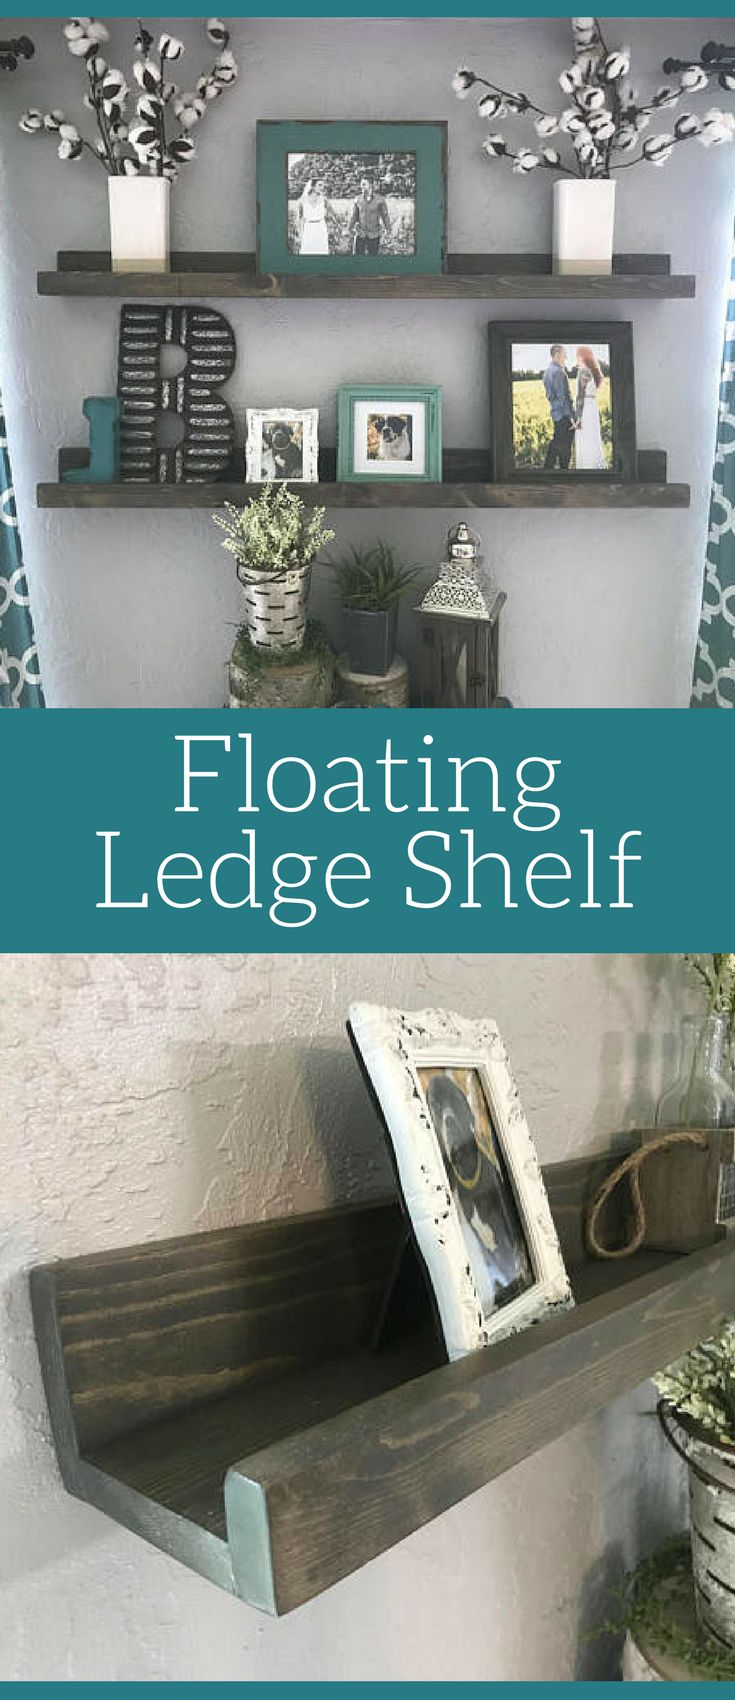 Floating Ledge Shelf, for holding dvd cases, getting them higher than little ones hands?